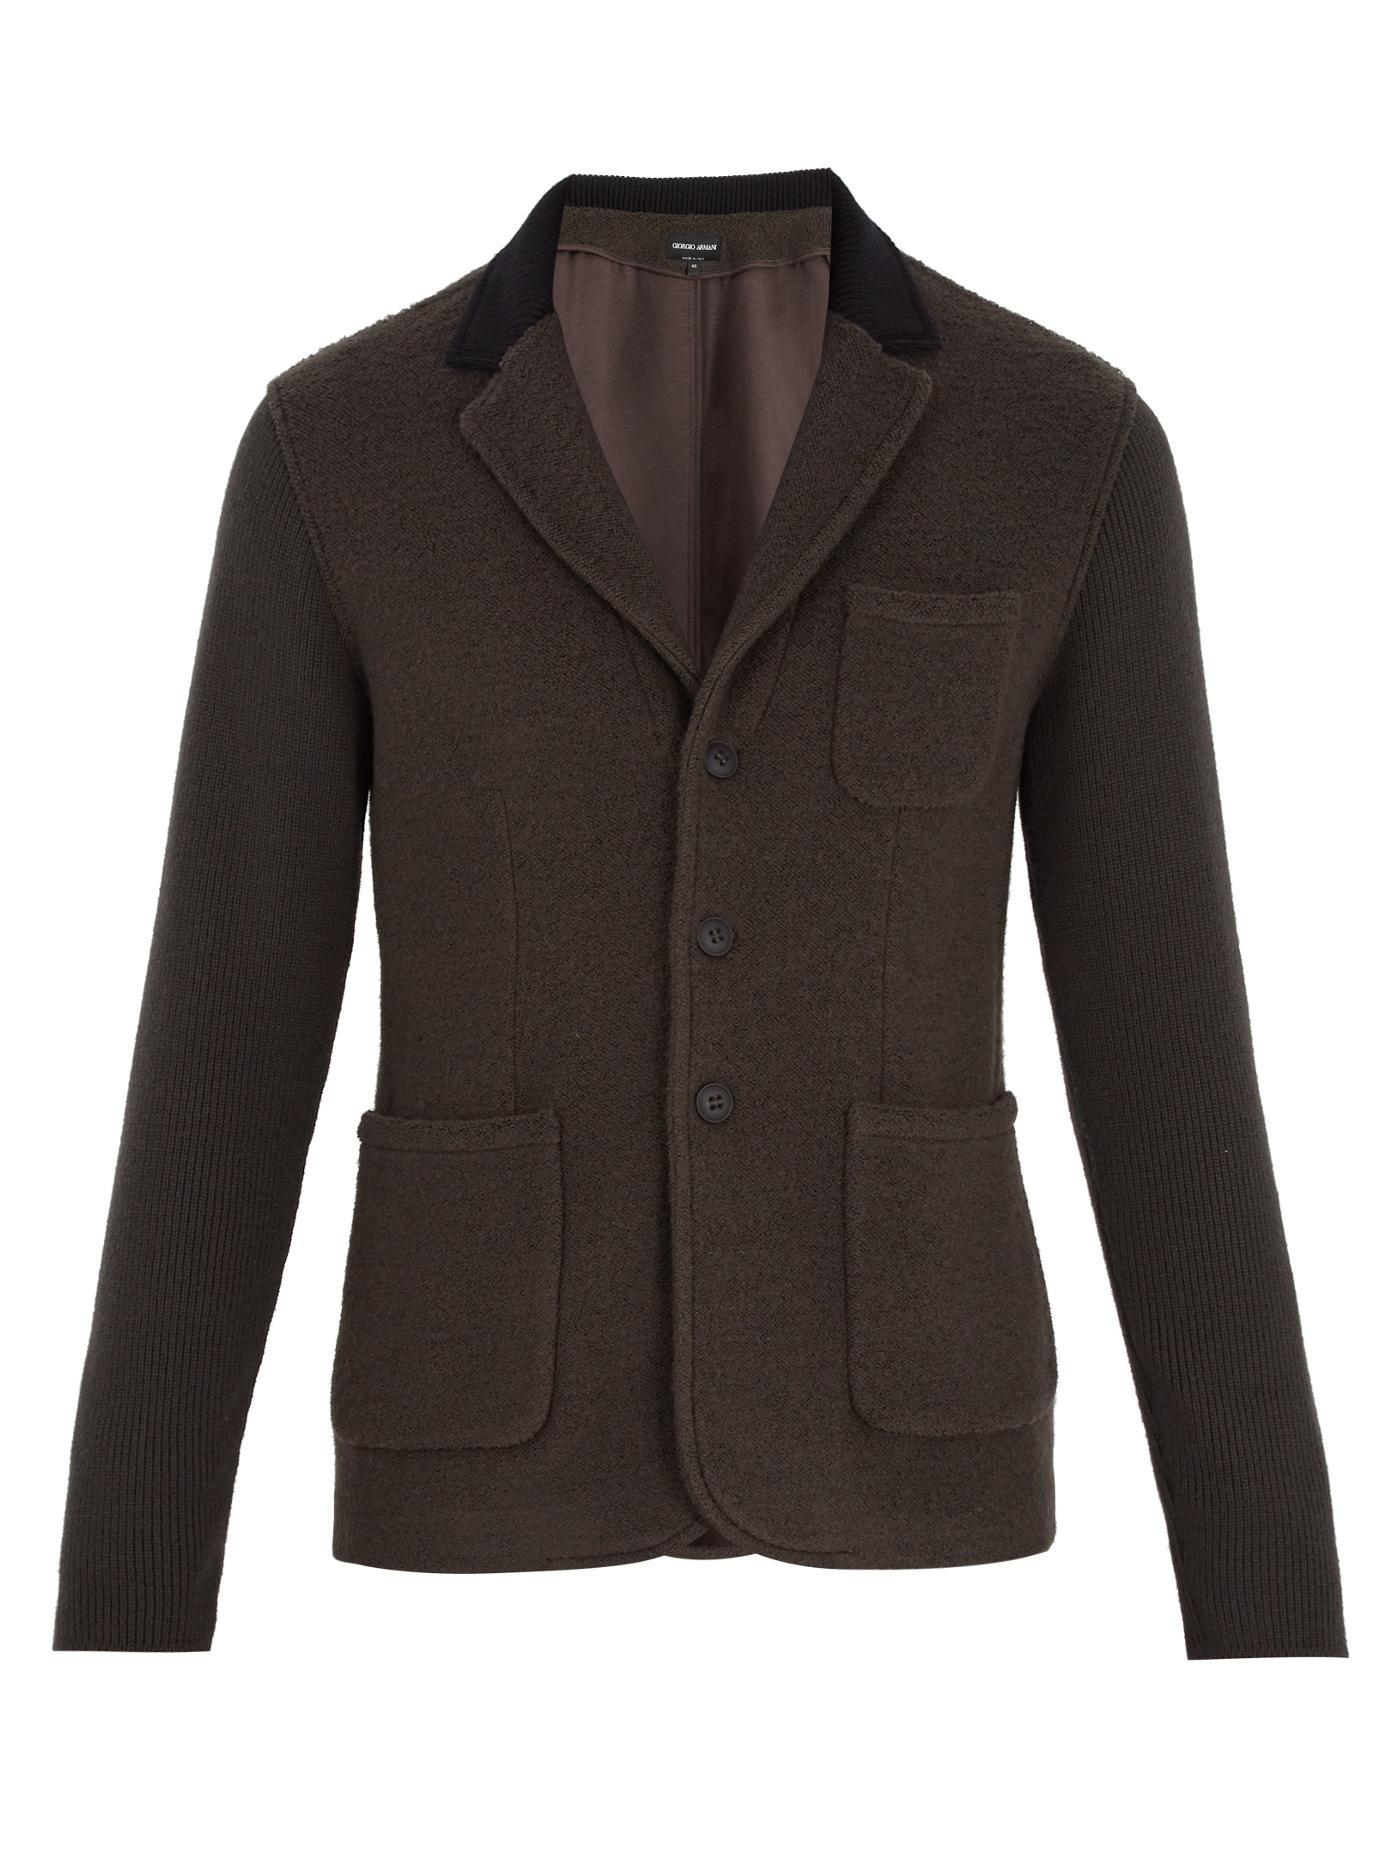 Giorgio Armani Patch-Pocket Wool-Blend Blazer In Brown